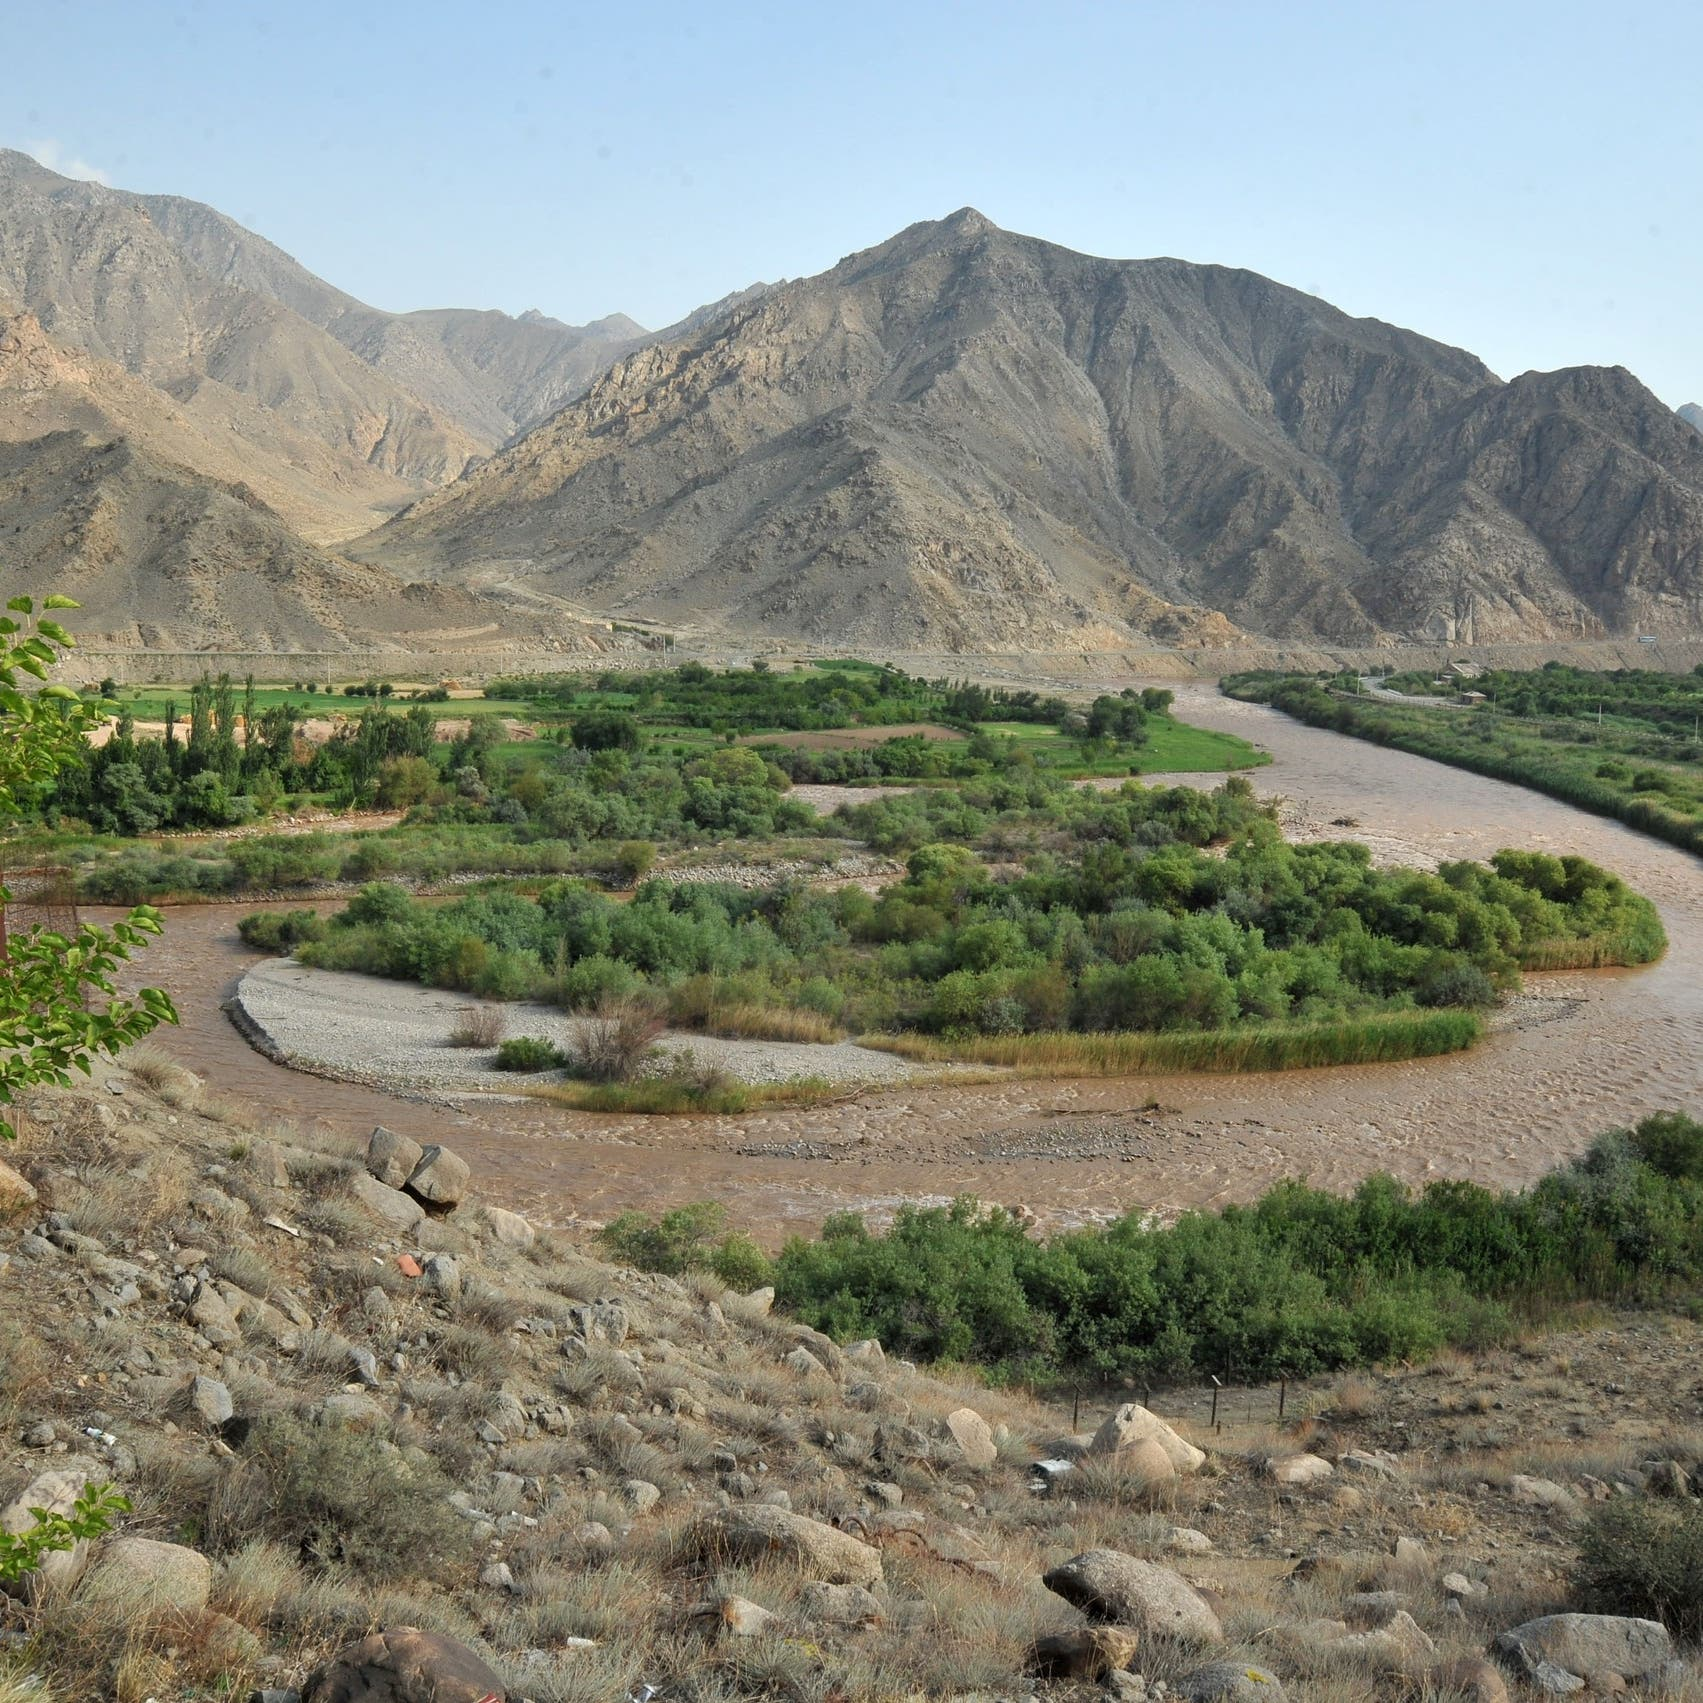 Two Azerbaijani border guards killed in Iran border shootout